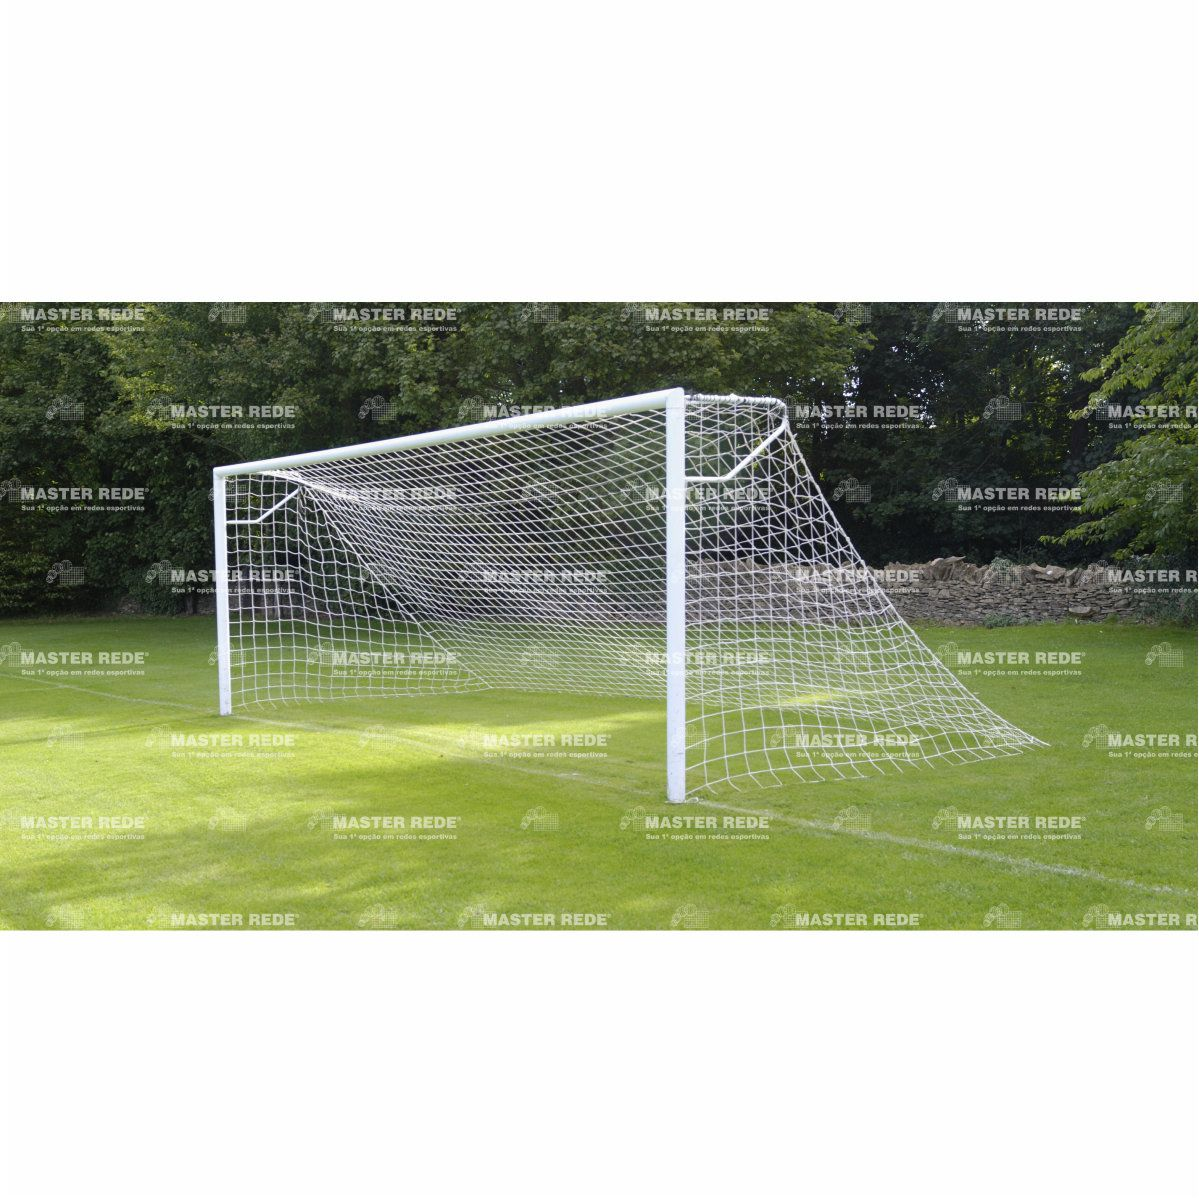 Rede Futebol Campo Master Rede de 7,5M Fio 2MM Seda FC-L2